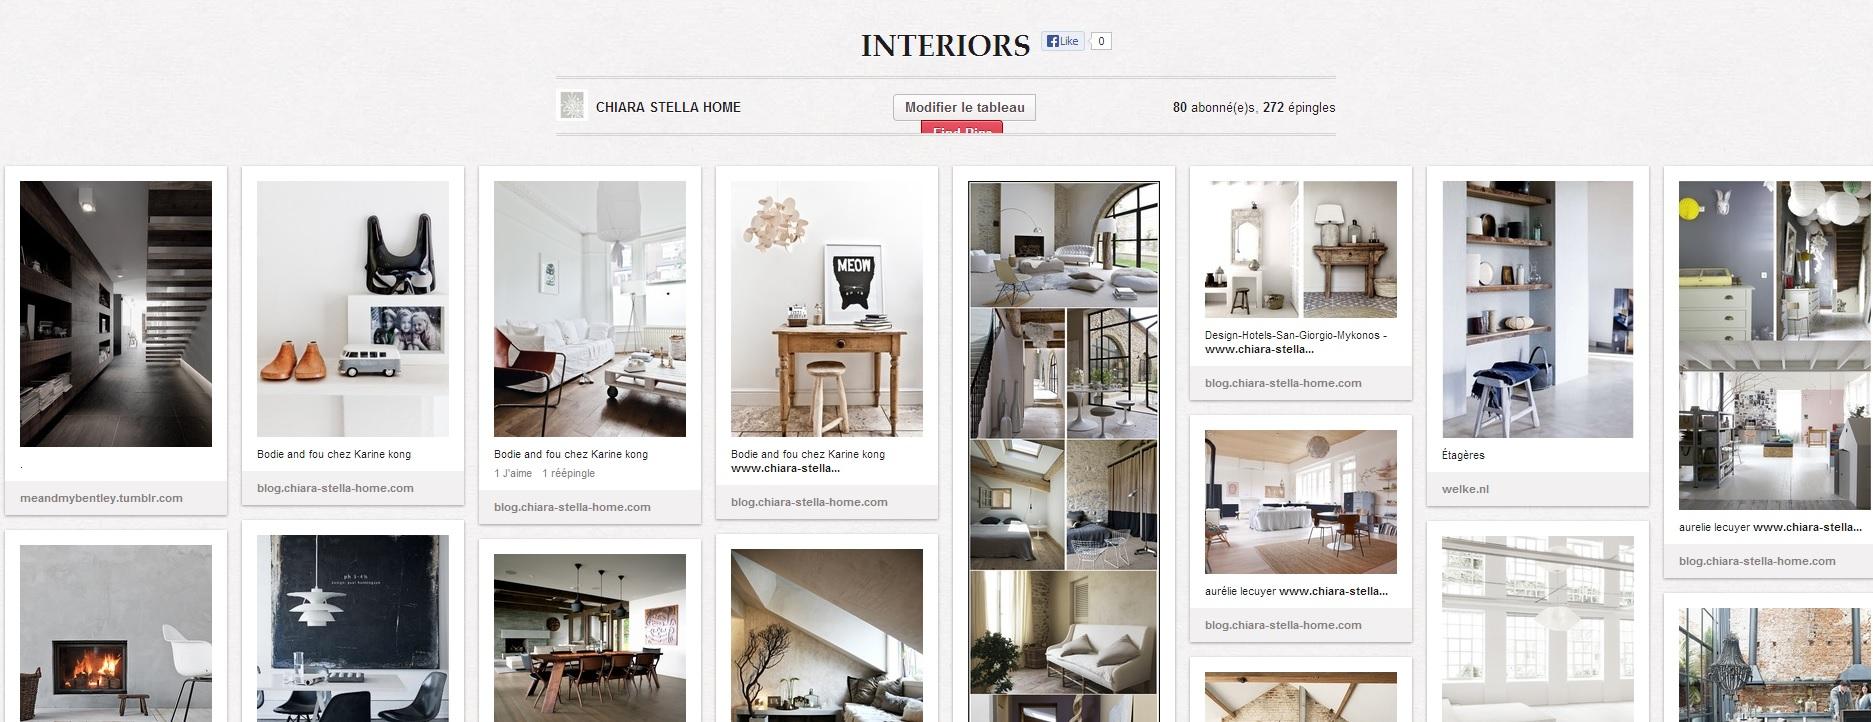 interiors pinterest chiara stella home.jpg